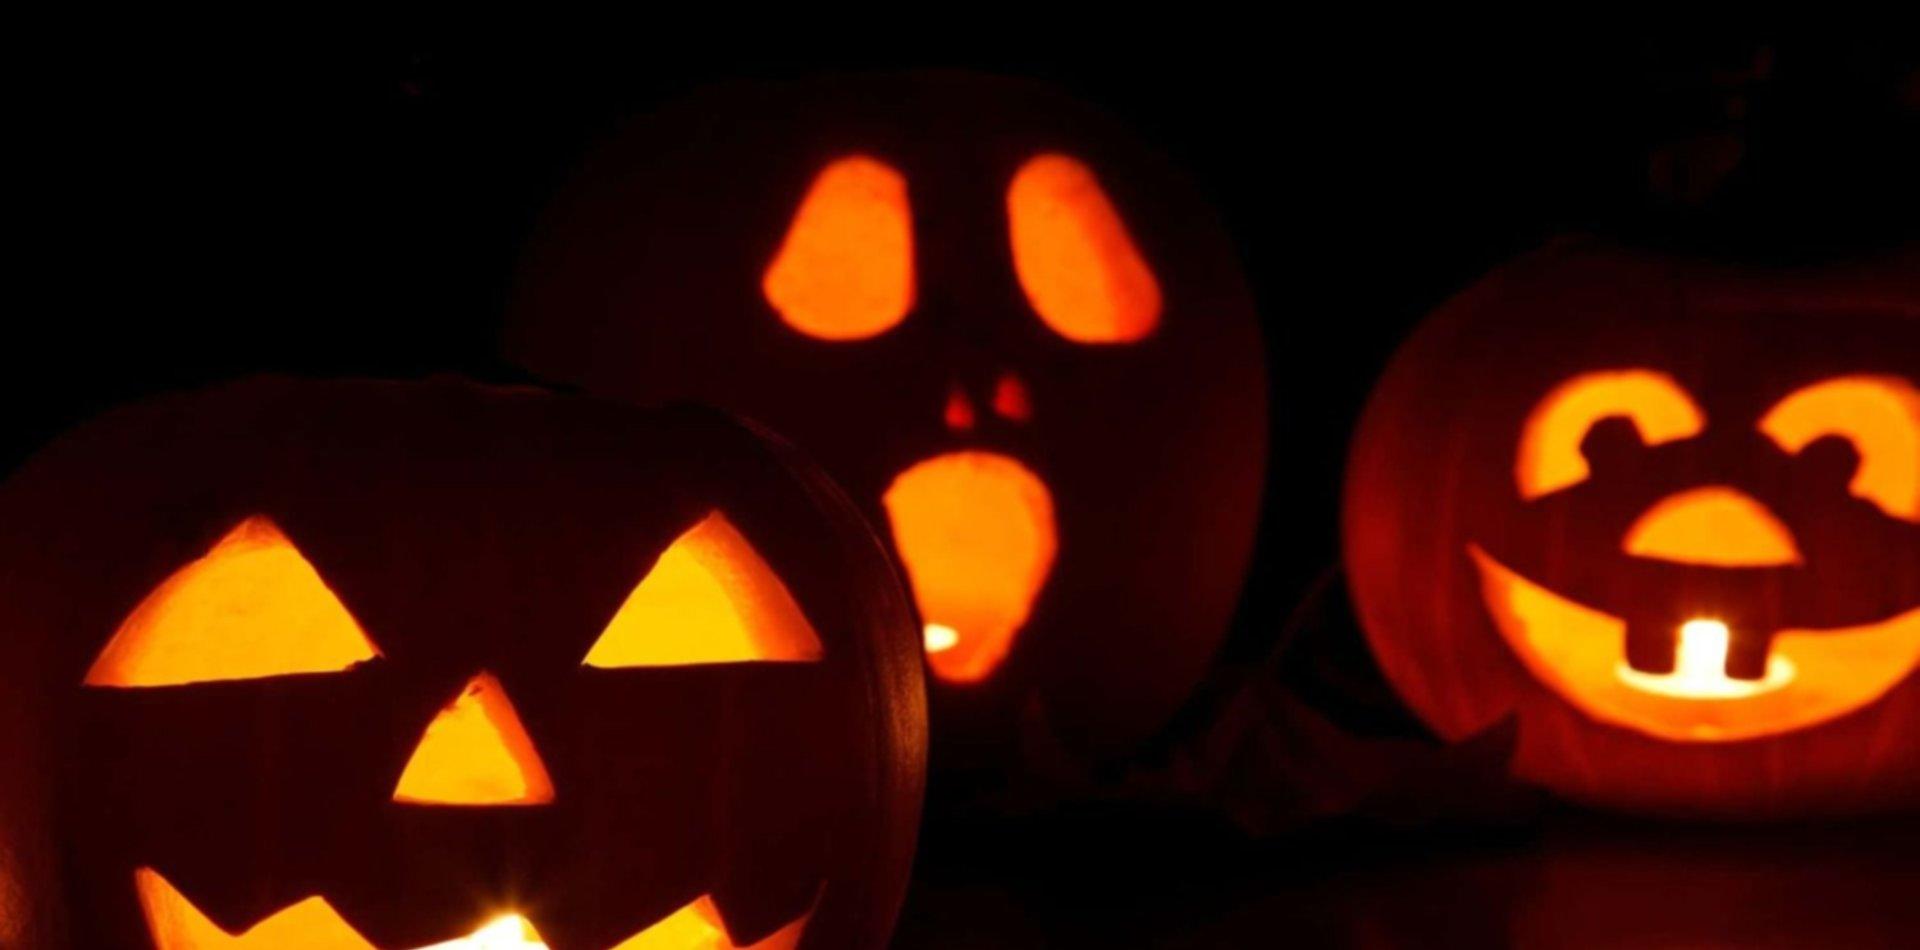 Se viene Ja Ja Jalowin, la versión autóctona de Halloween